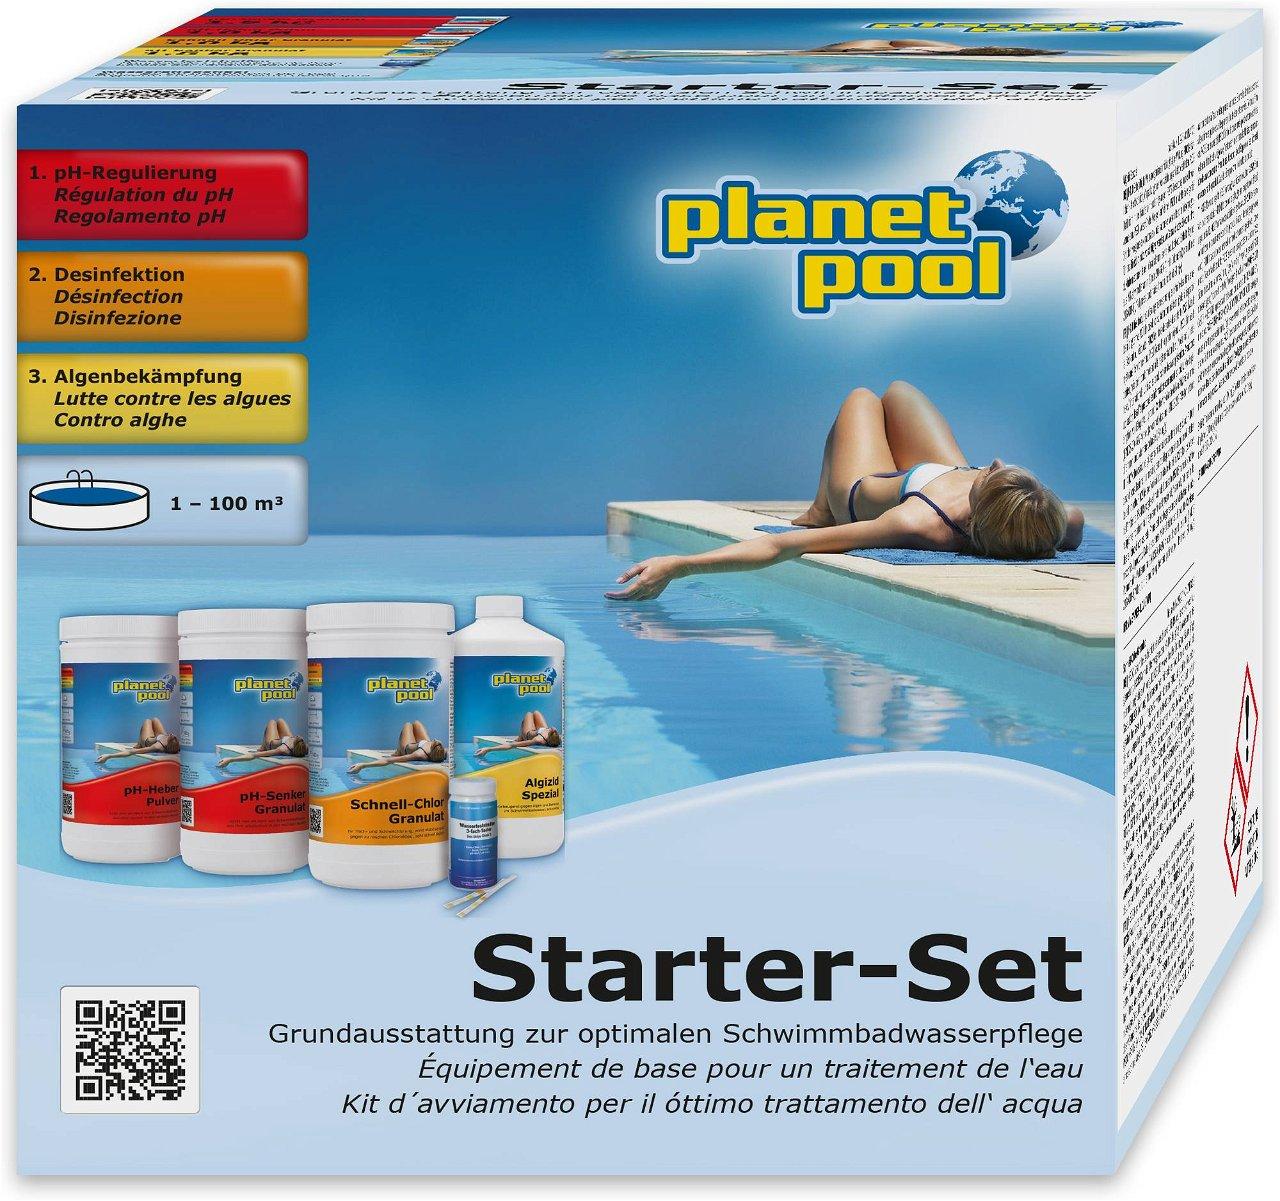 Planet Pool Wasserpflege Starter-Set